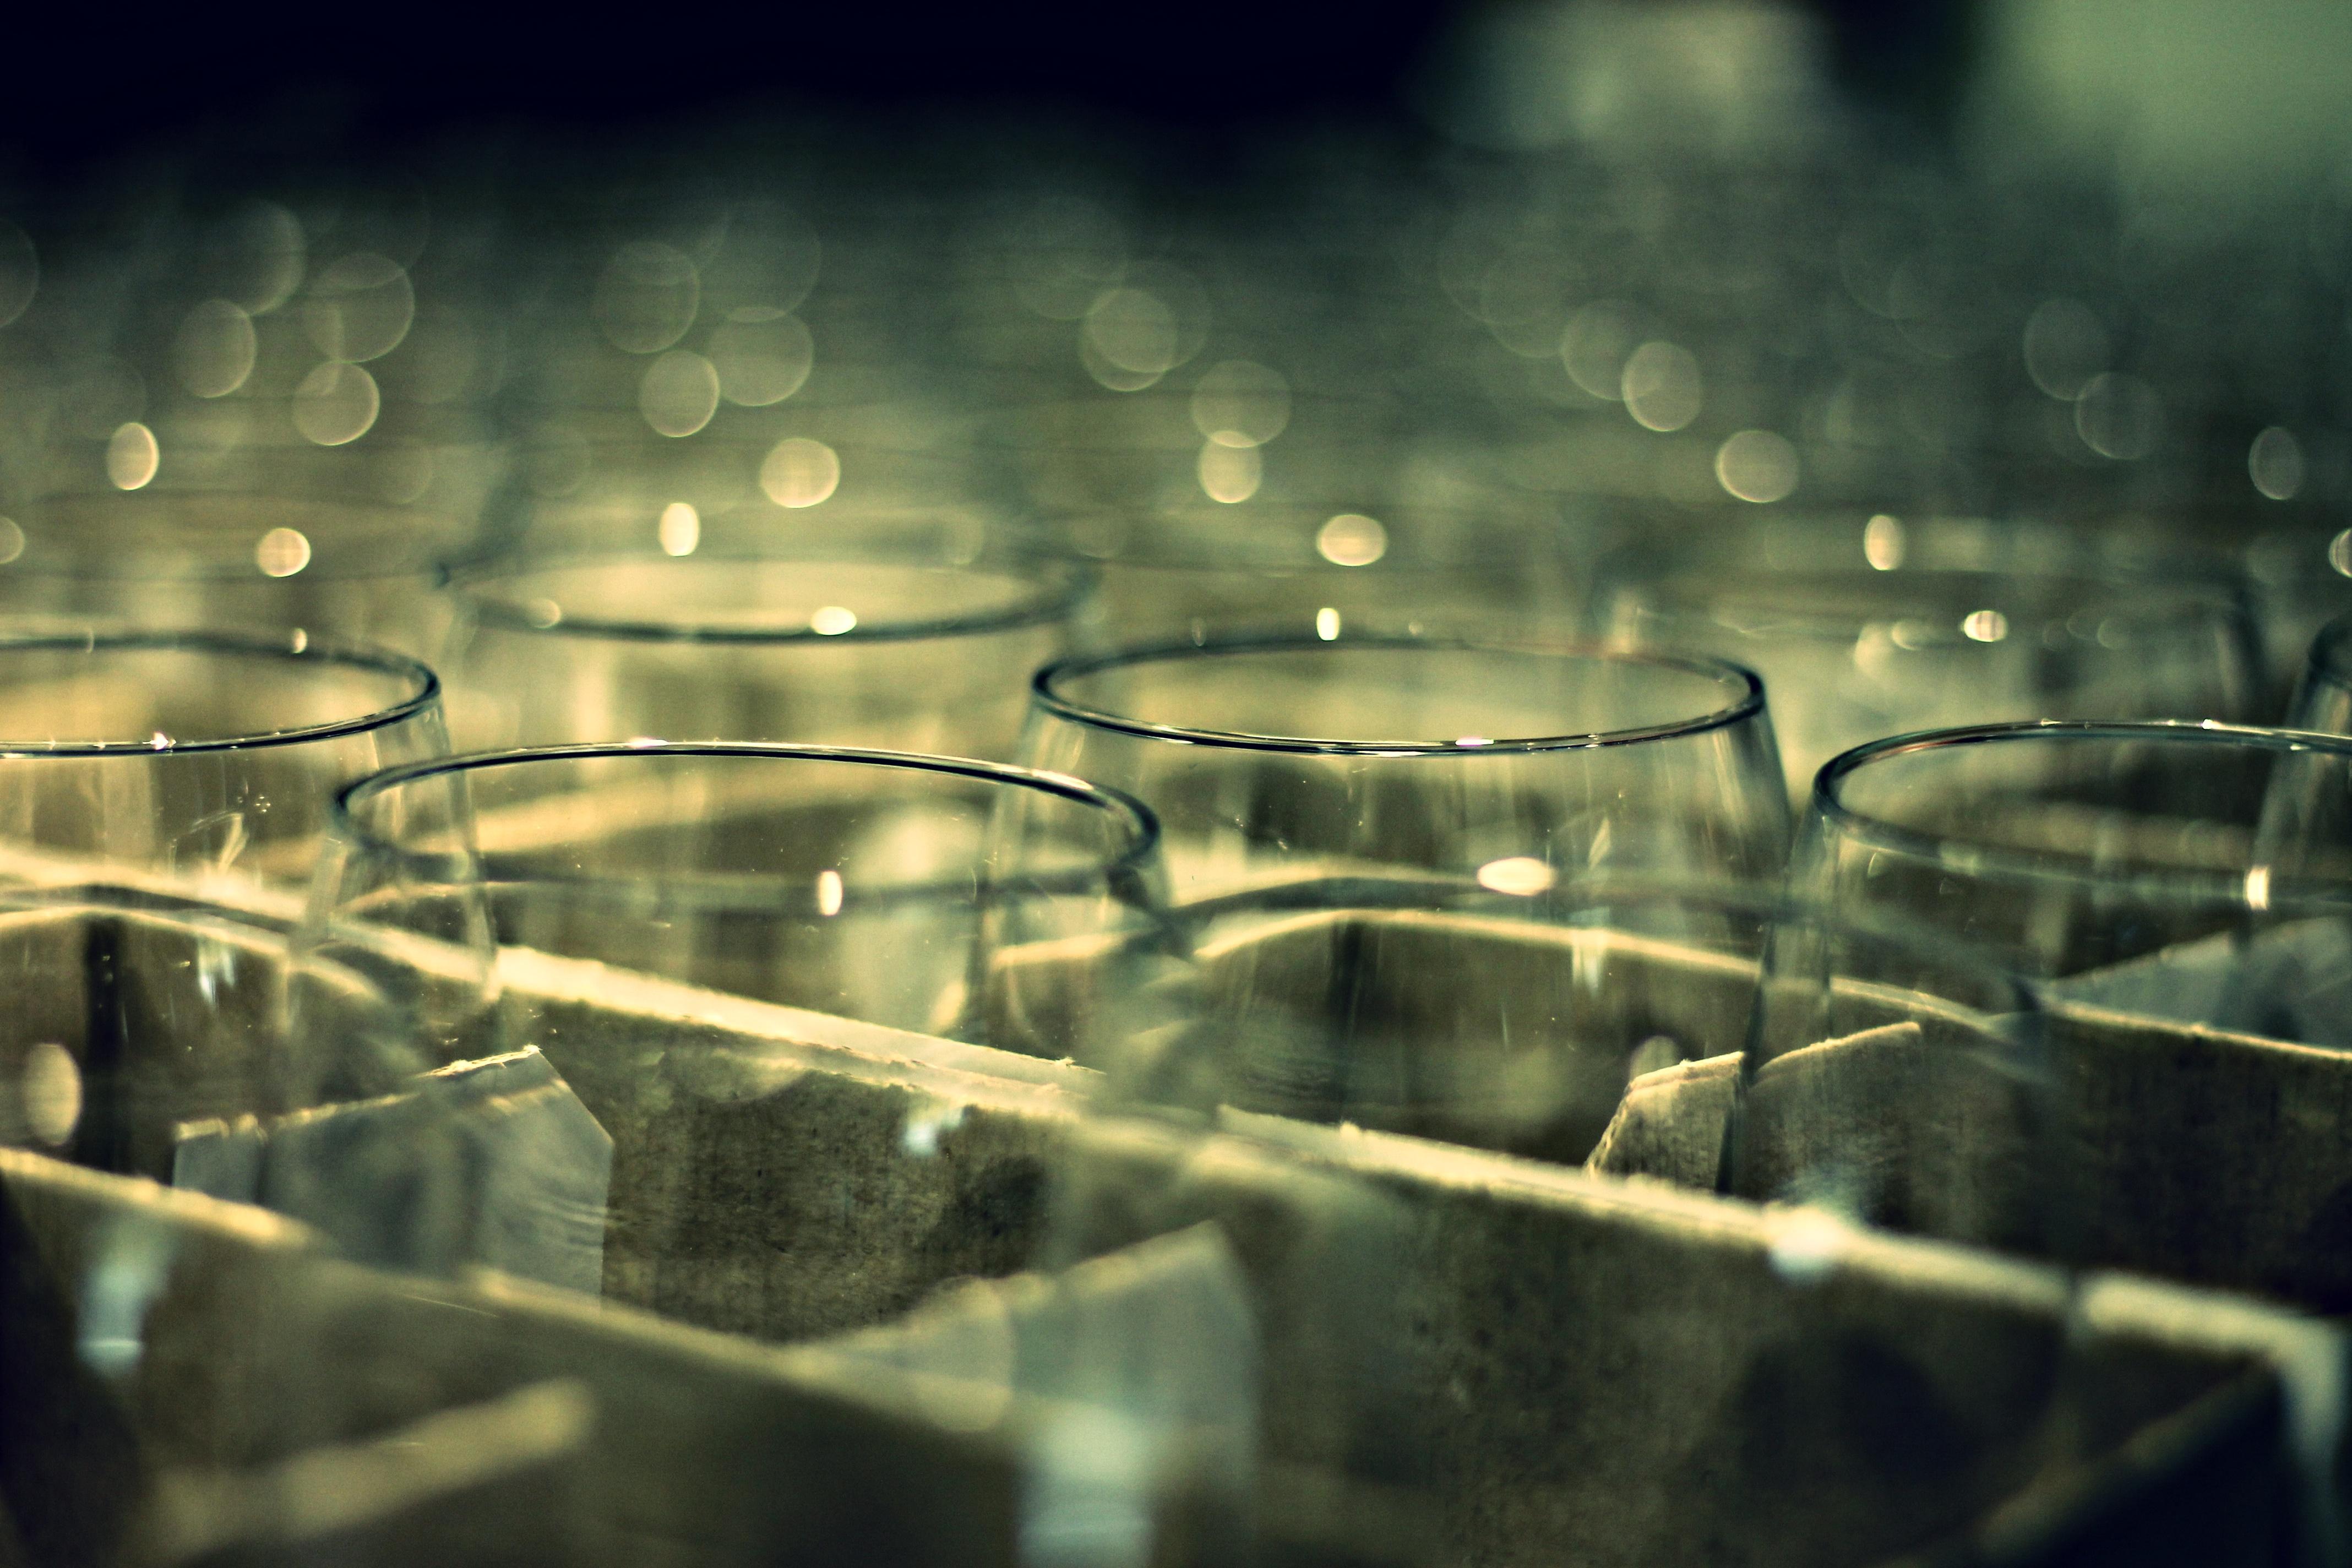 Camera Cinema Blur IKEA Glass Beautiful Canon Vintage Eos Travels Wine Bokeh Empty Filter Caught Canoneos